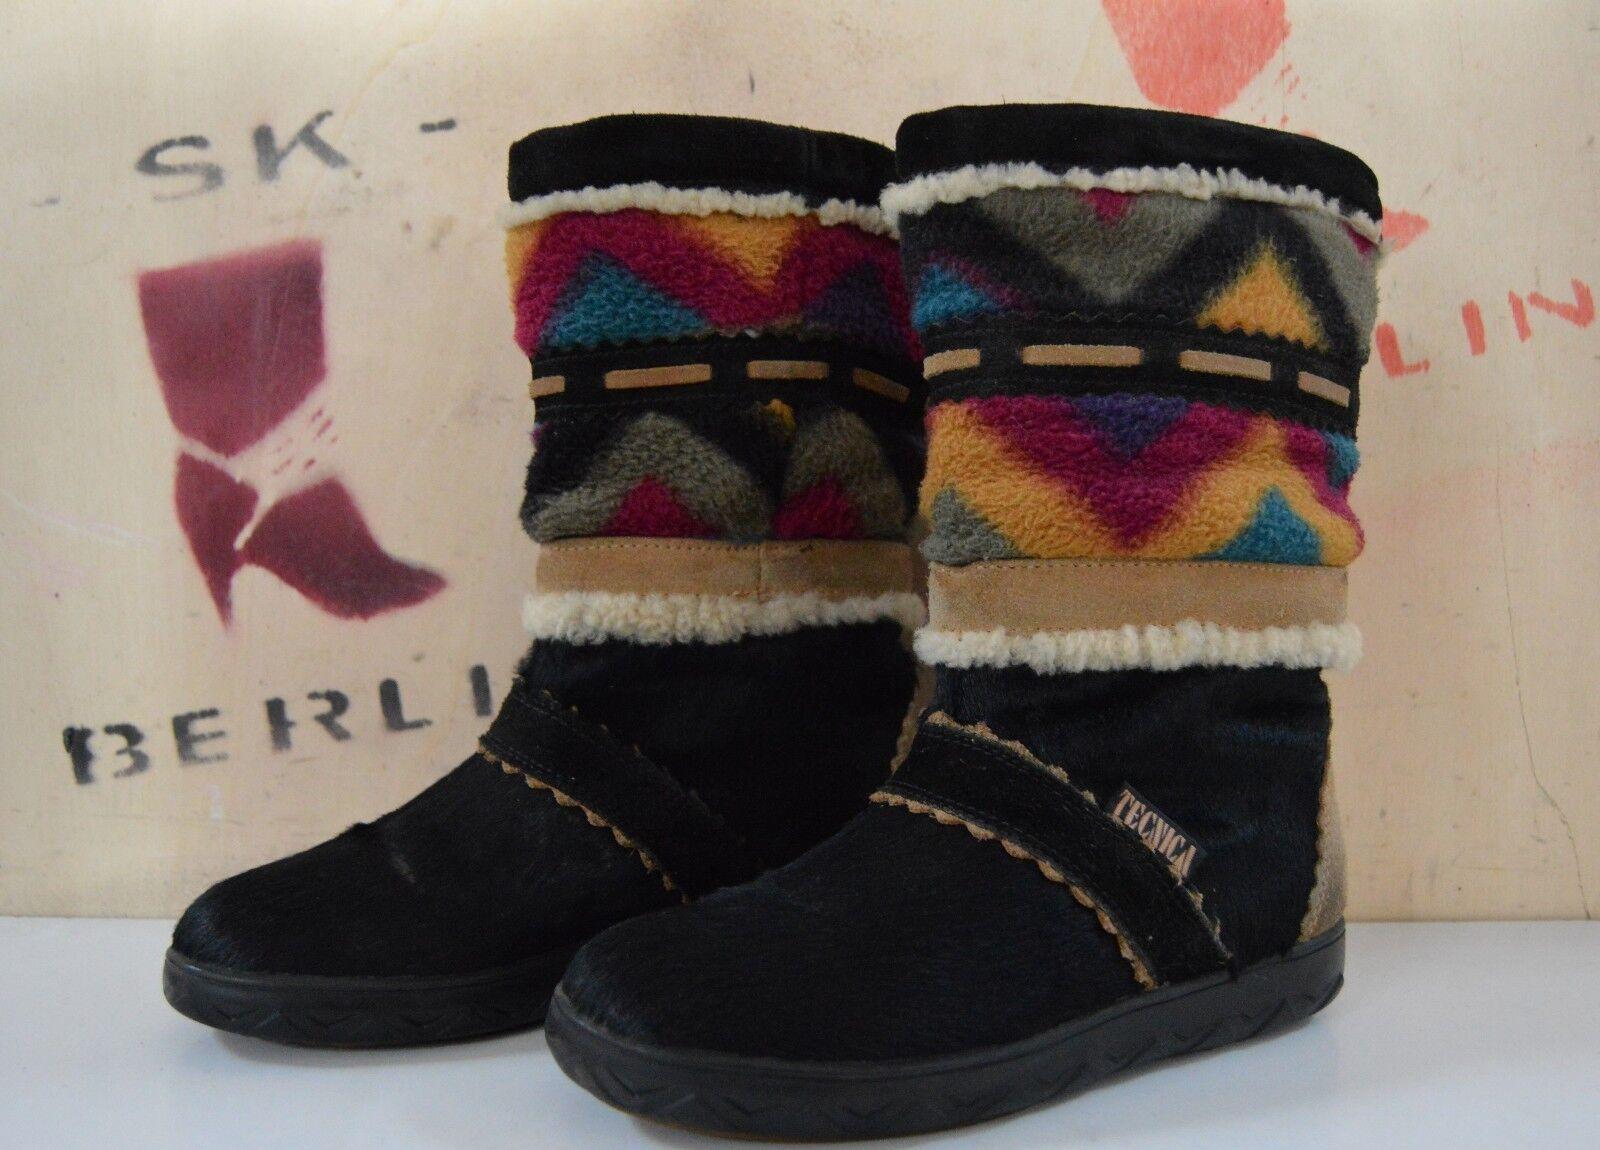 Tecnica made botas in italy chimayo señora botas made True vintage botas fur invierno Snow e8c67e